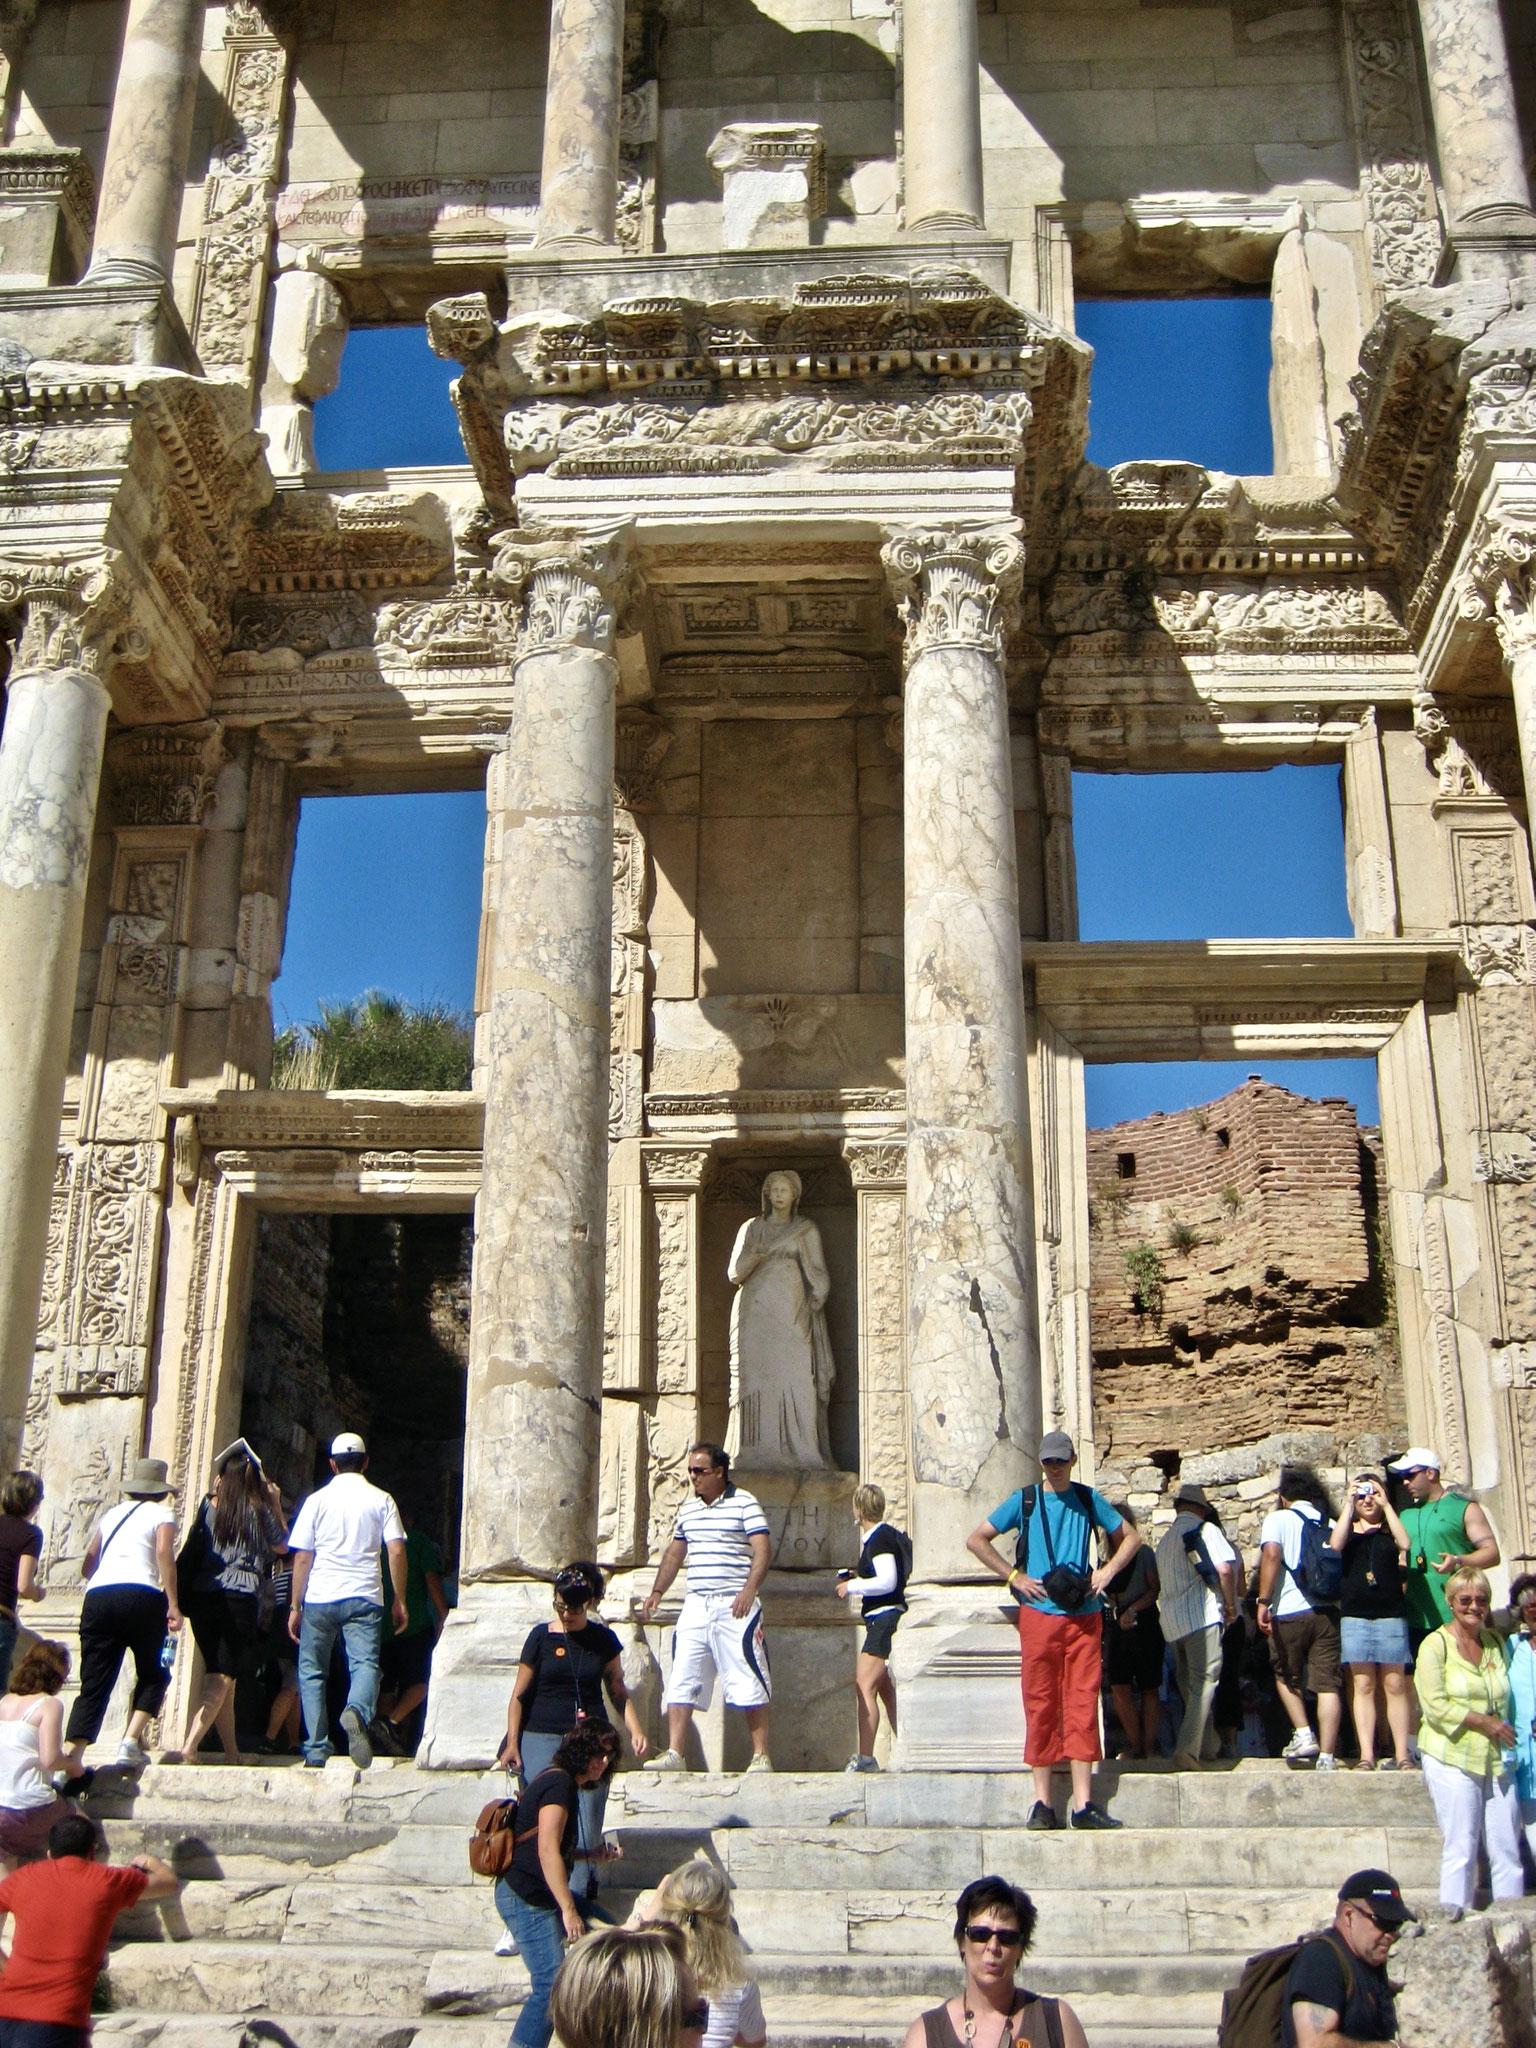 Library of Celsus, Ephesus (Selçuk), formally Anatolia